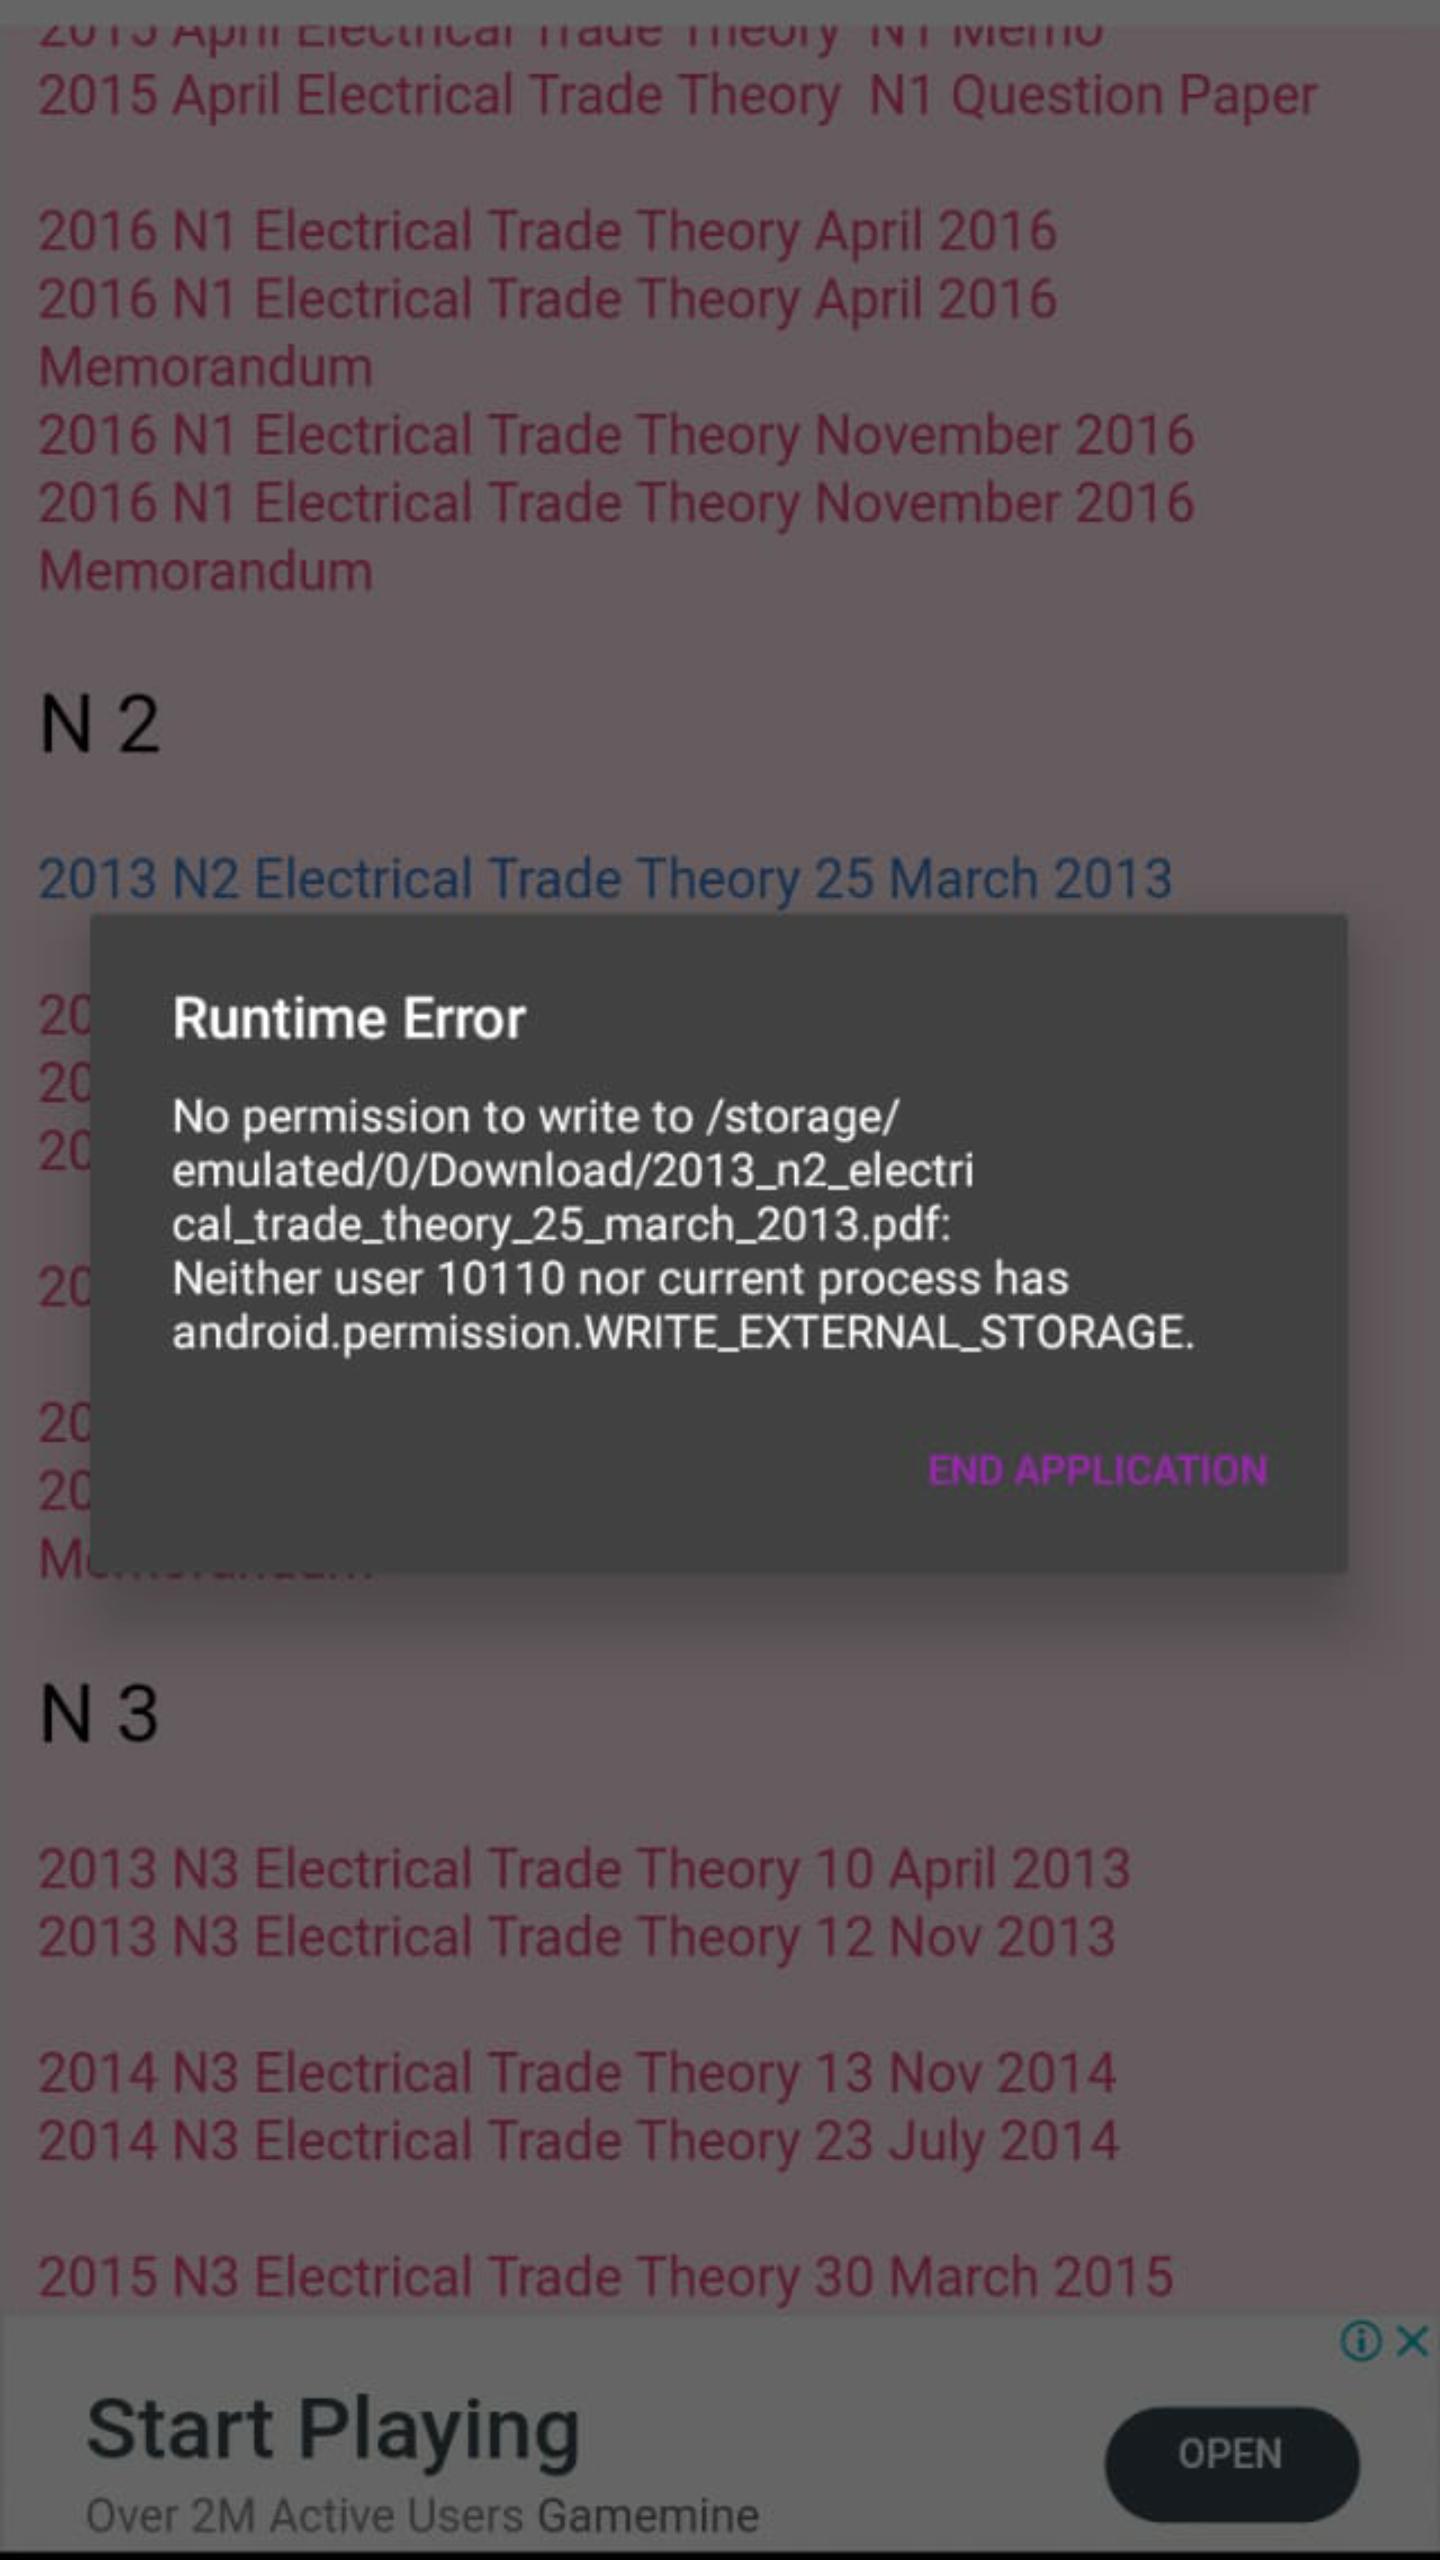 Android Permission Write_External_Storage runtime error - no permission to write to storage - discuss